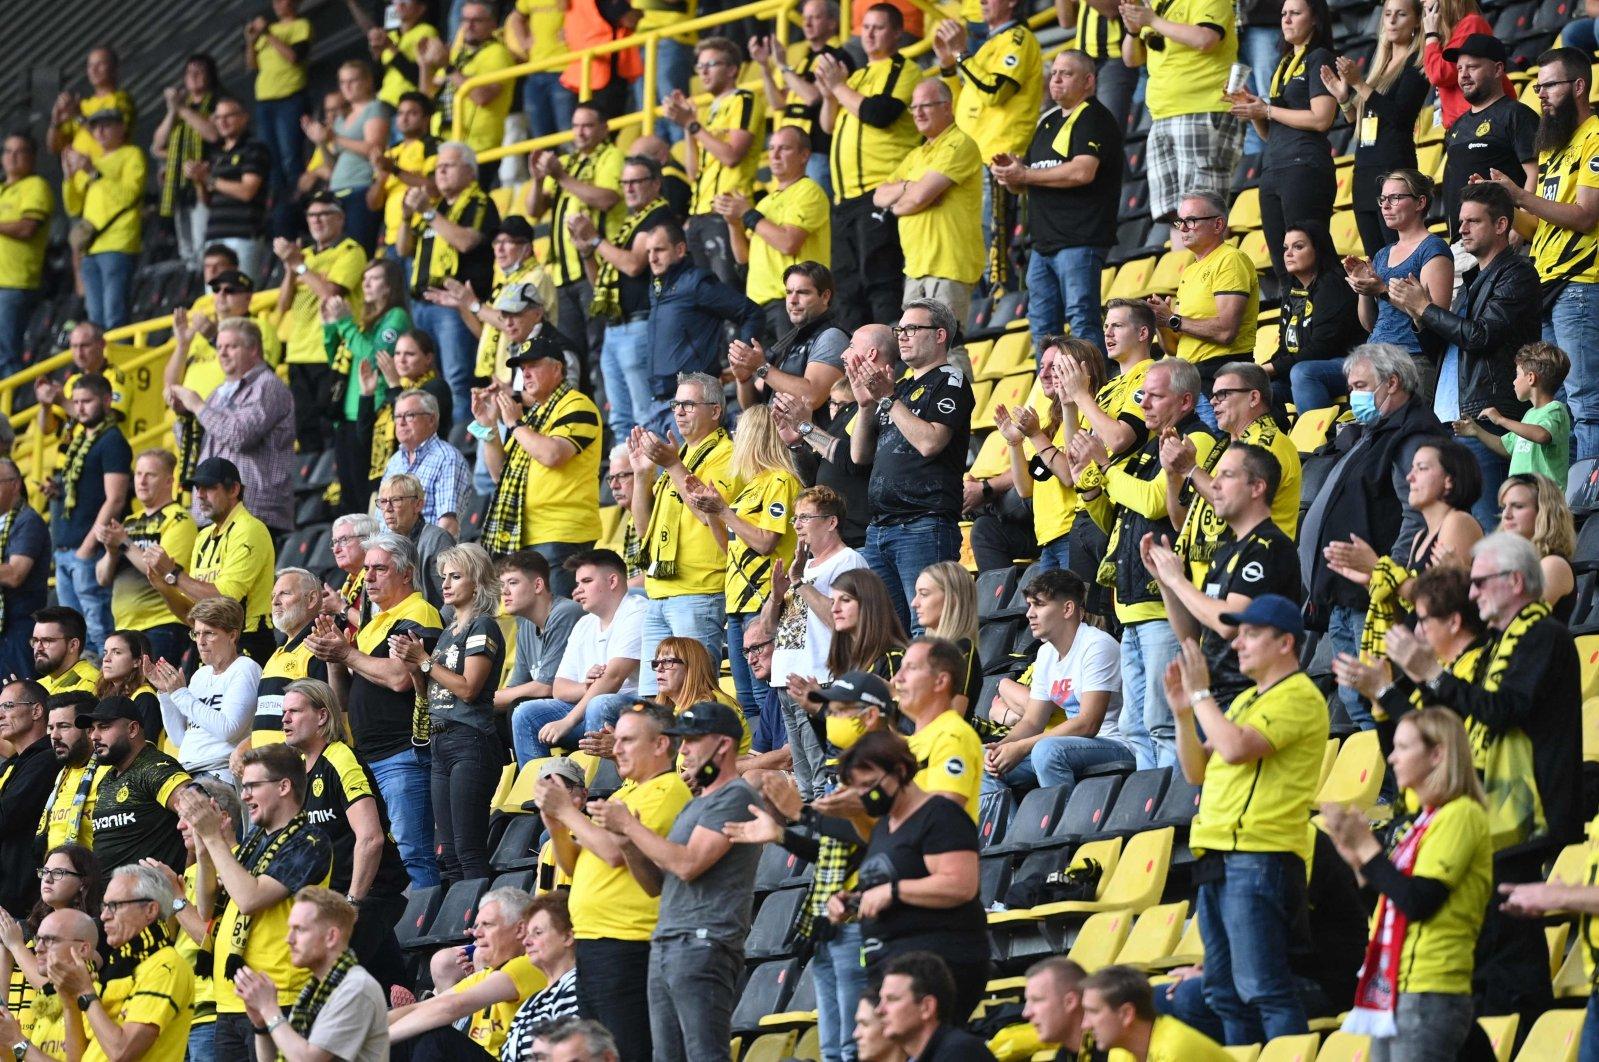 Borussia Dortmund fans applaud during the German Bundesliga football match between Borussia Dortmund and Borussia Monchengladbach in Dortmund, western Germany, Sept. 19, 2020. (AFP Photo)